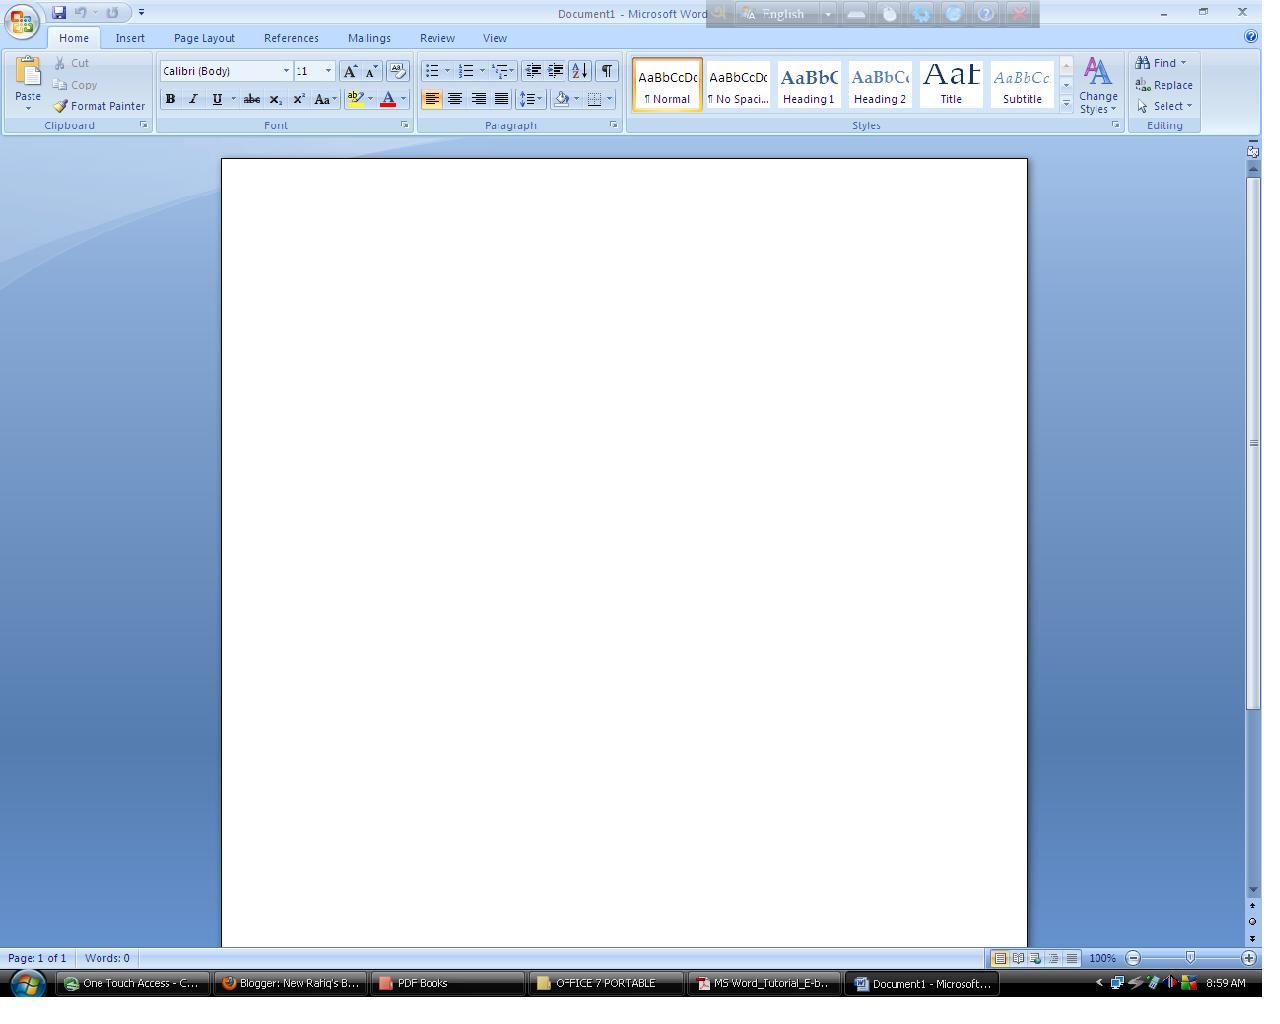 Microsoft Word Tutorial E-book in Bangla - Bangla pdf tutorial ebook